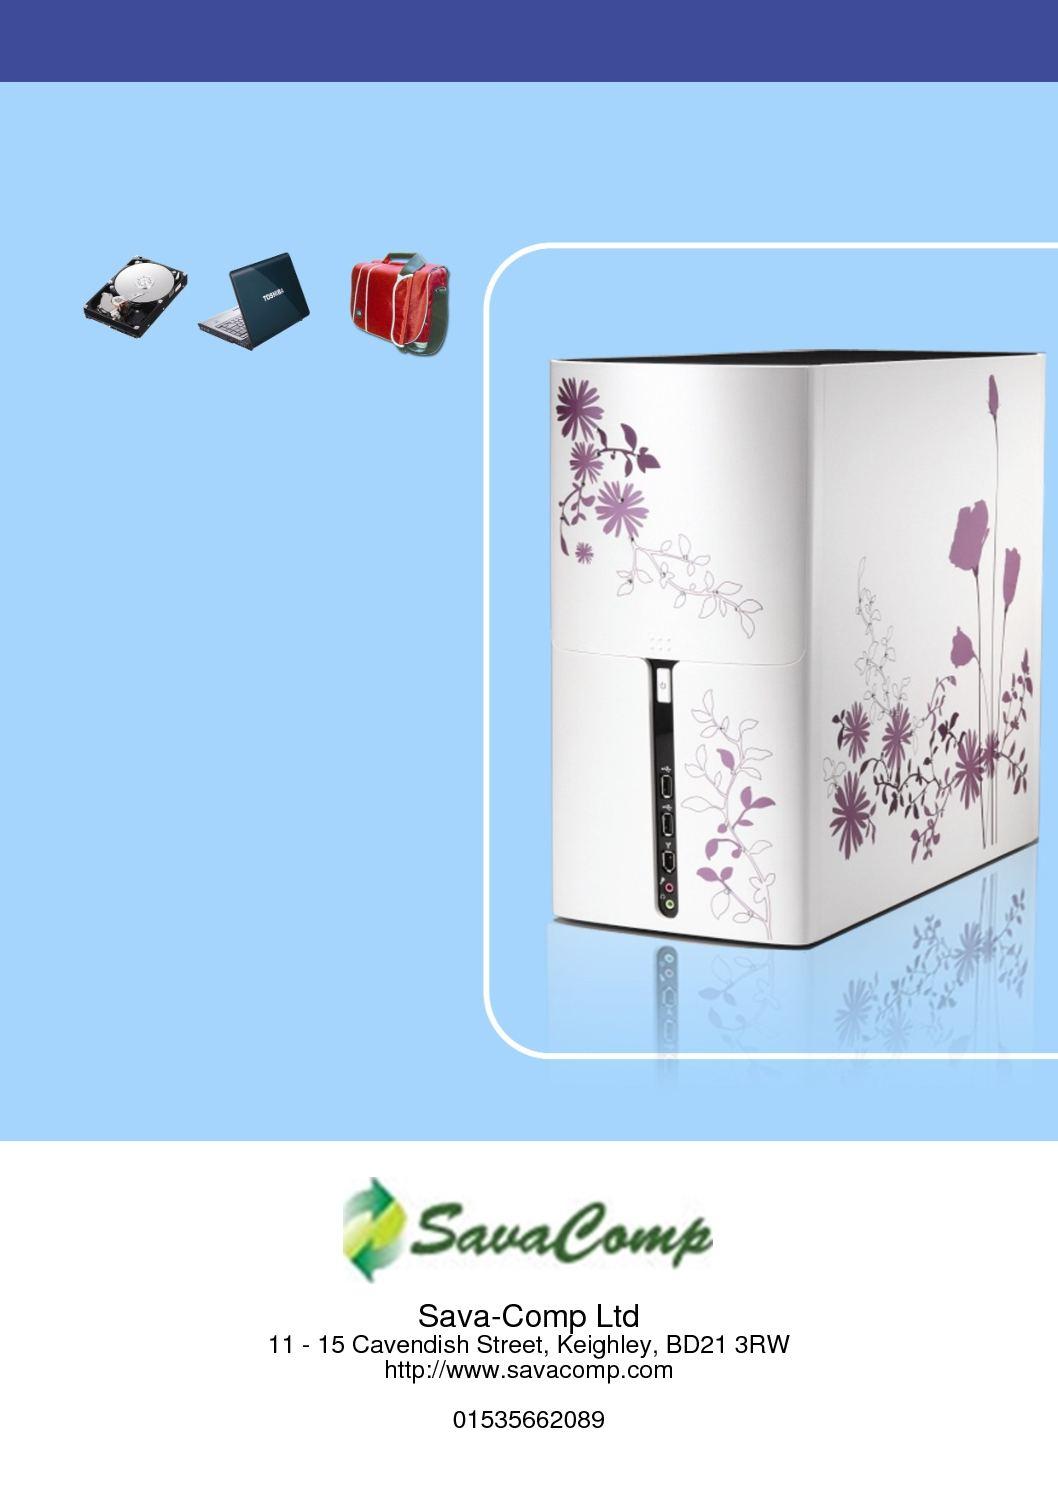 Calamo Sava Comp Ltd Online Catalog Edimax Es 5160g V3 16 Port Gigabit Ethernet Web Smart Switch